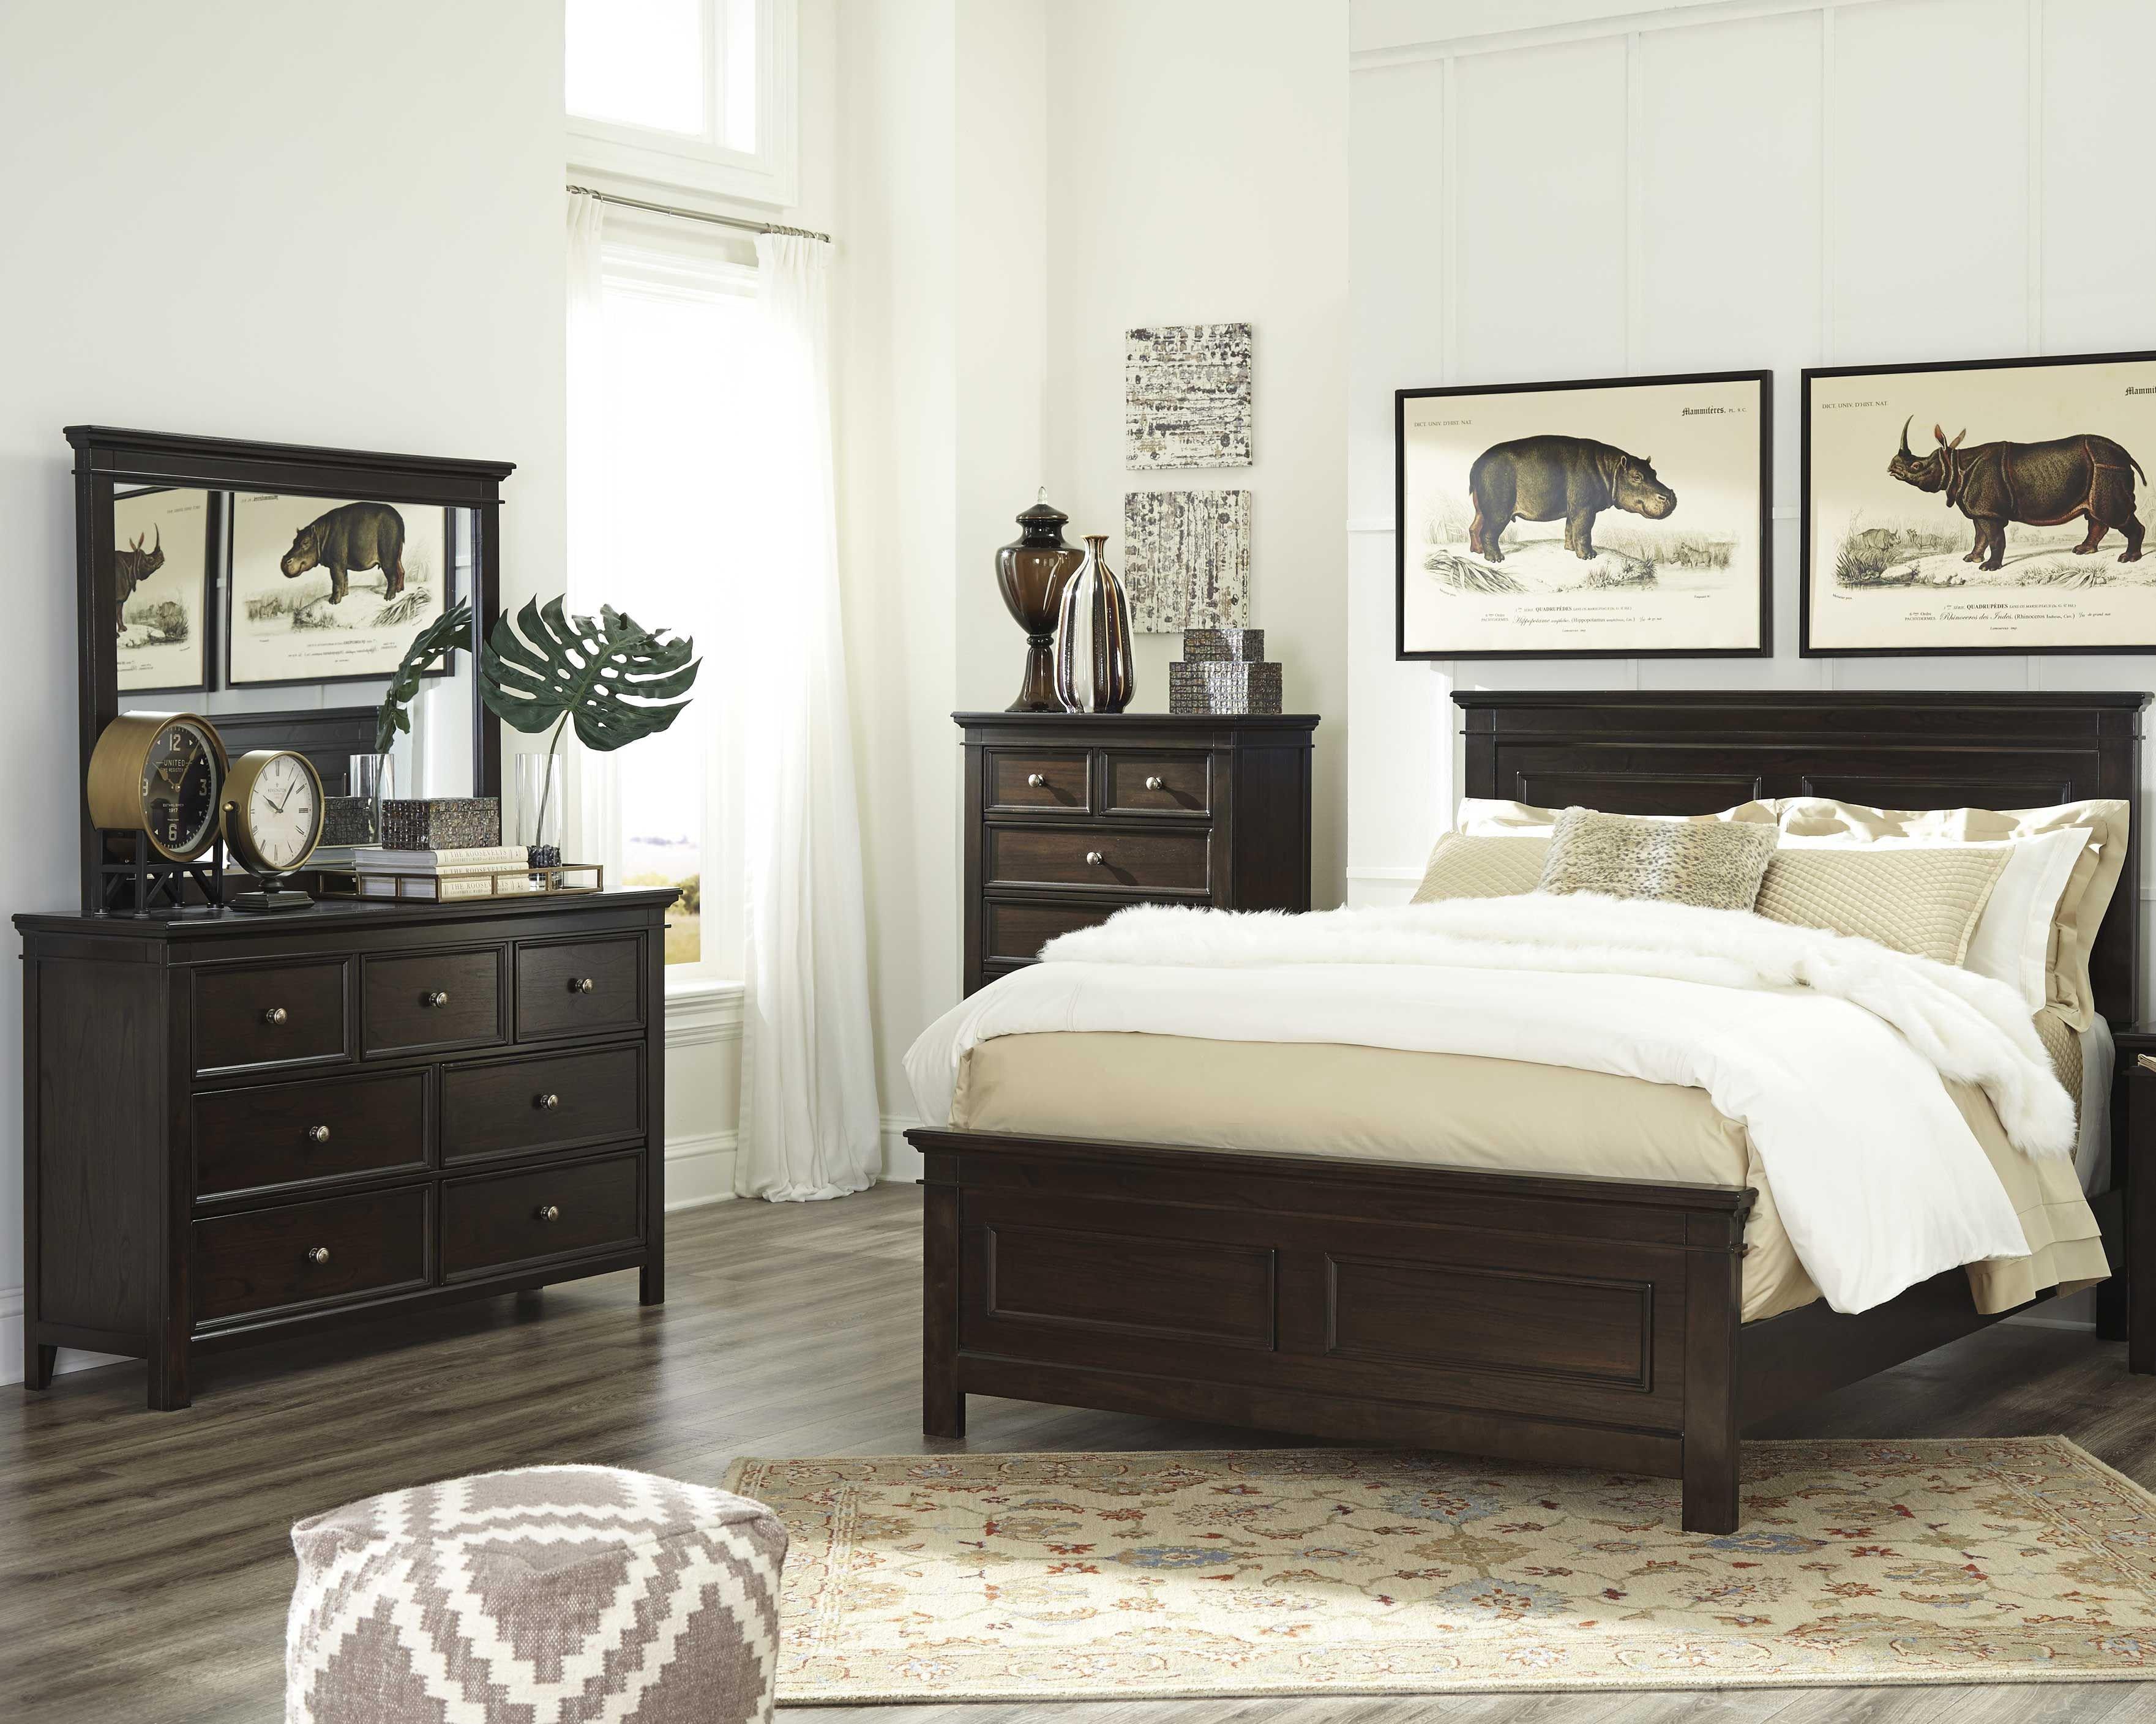 Bedroom Set ashley Furniture Unique Alexee 5 Piece King Bedroom Dark Brown